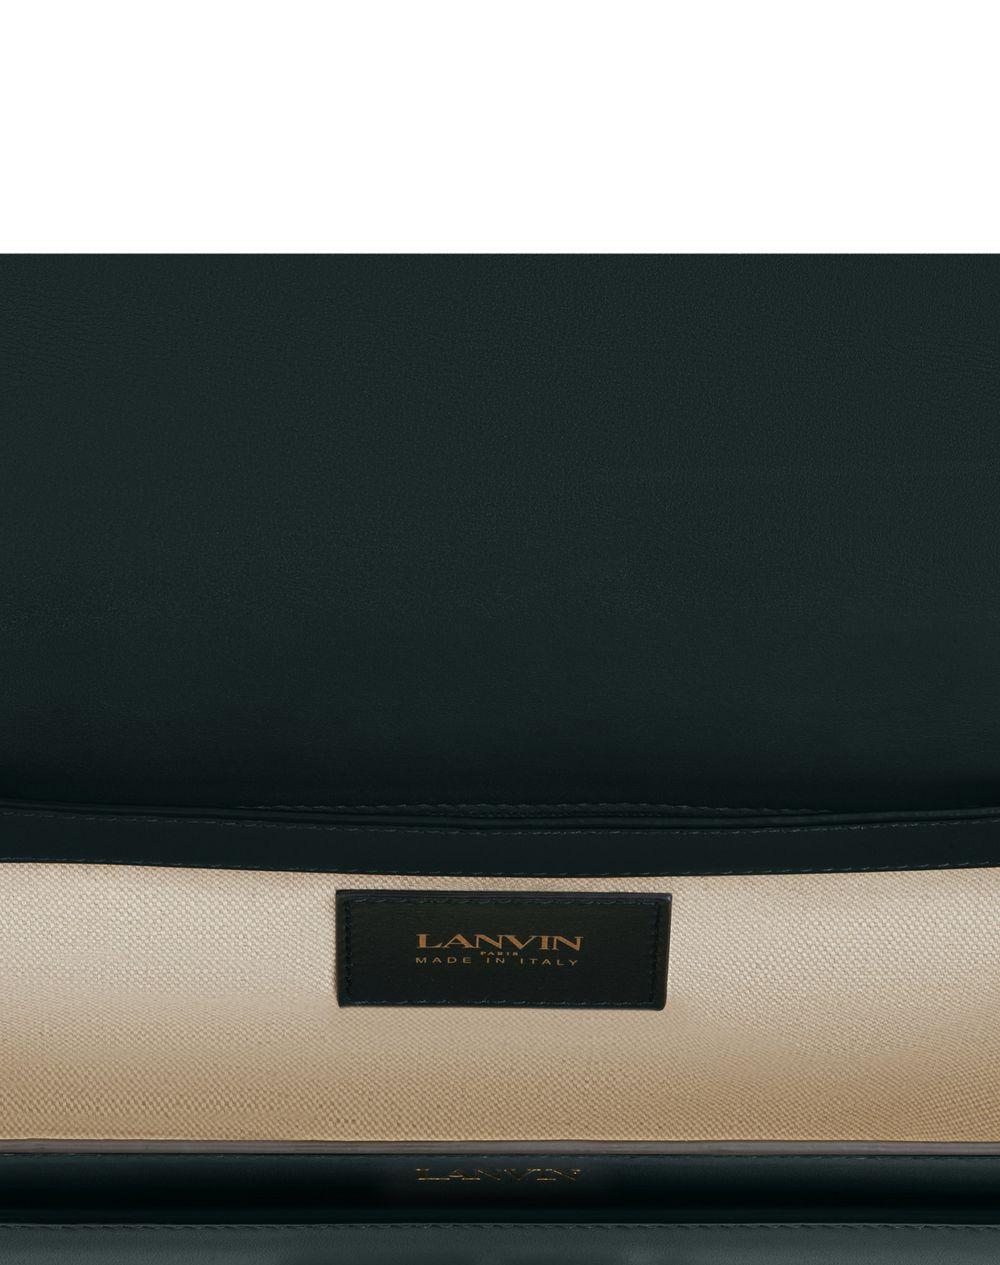 SWAN BOX BAG MM IN CALFSKIN LEATHER - Lanvin